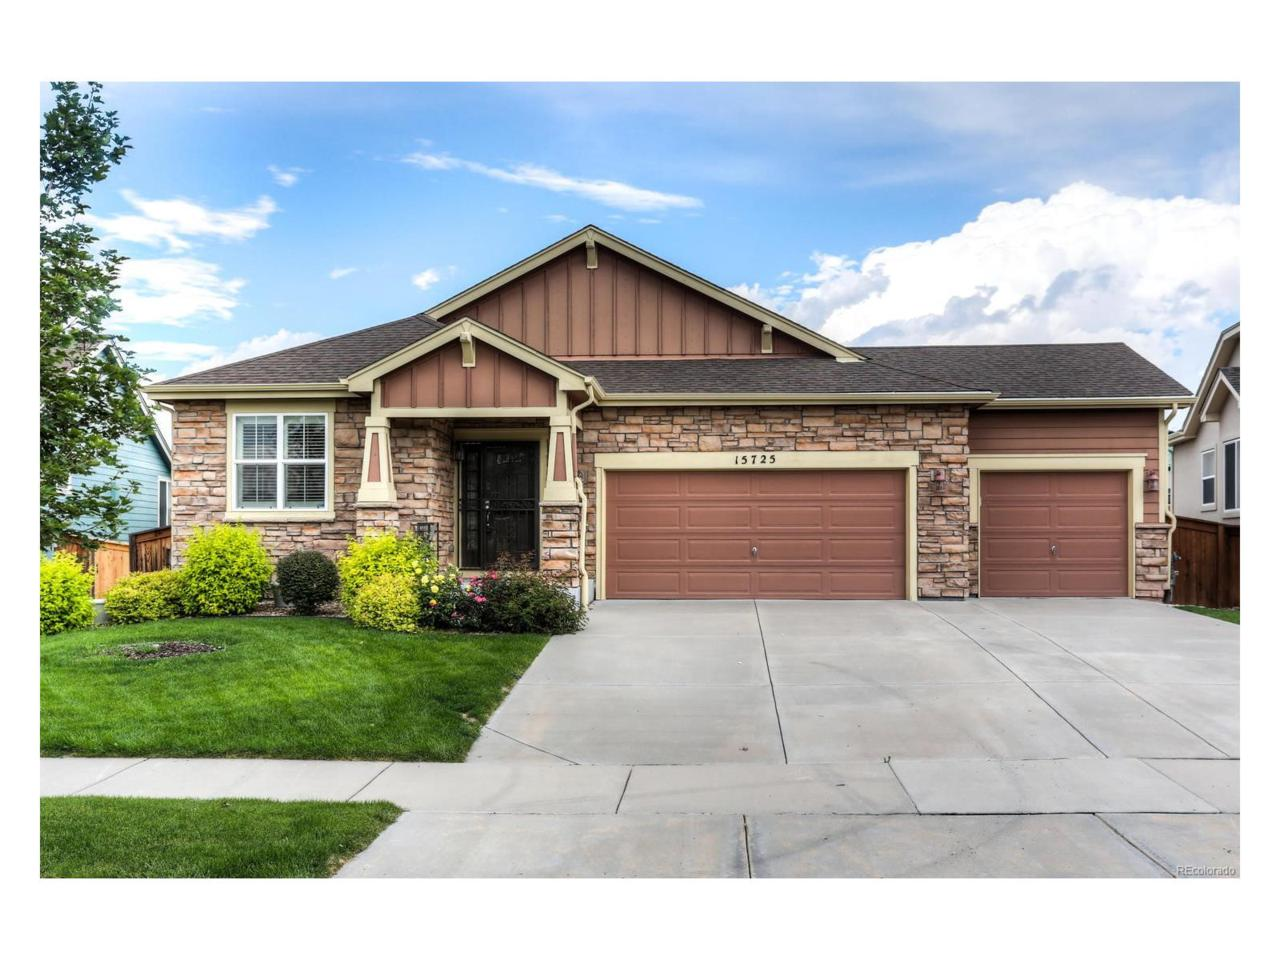 15725 Carob Circle, Parker, CO 80134 (MLS #8681072) :: 8z Real Estate